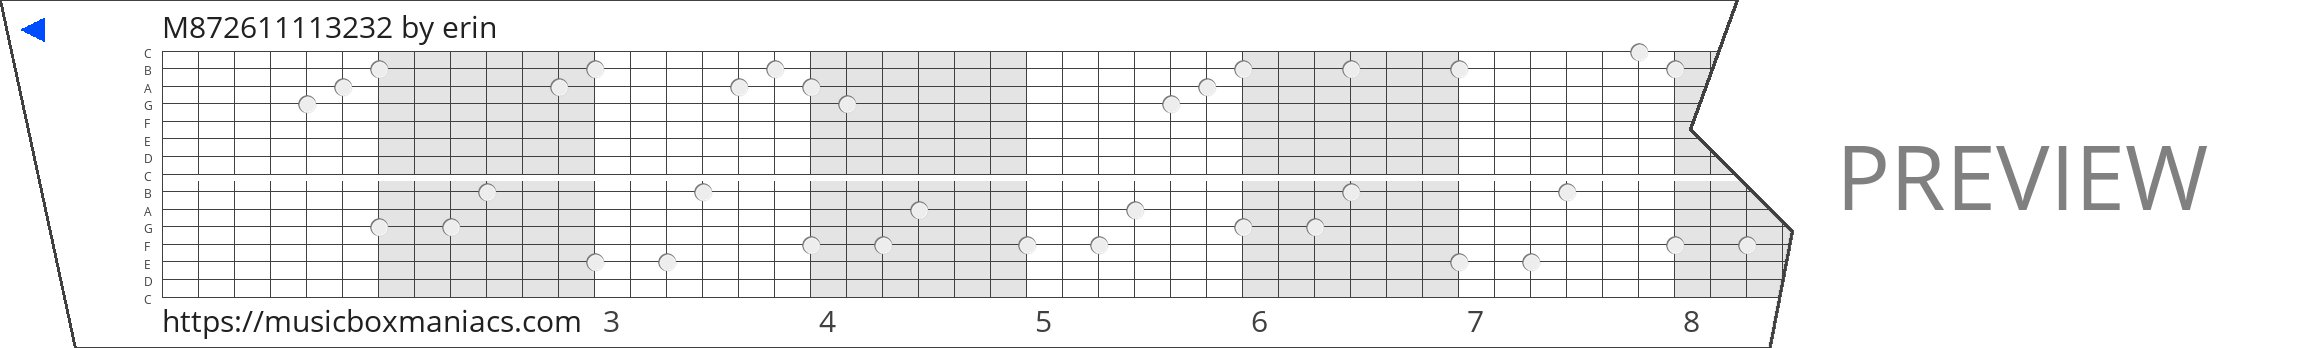 M872611113232 15 note music box paper strip